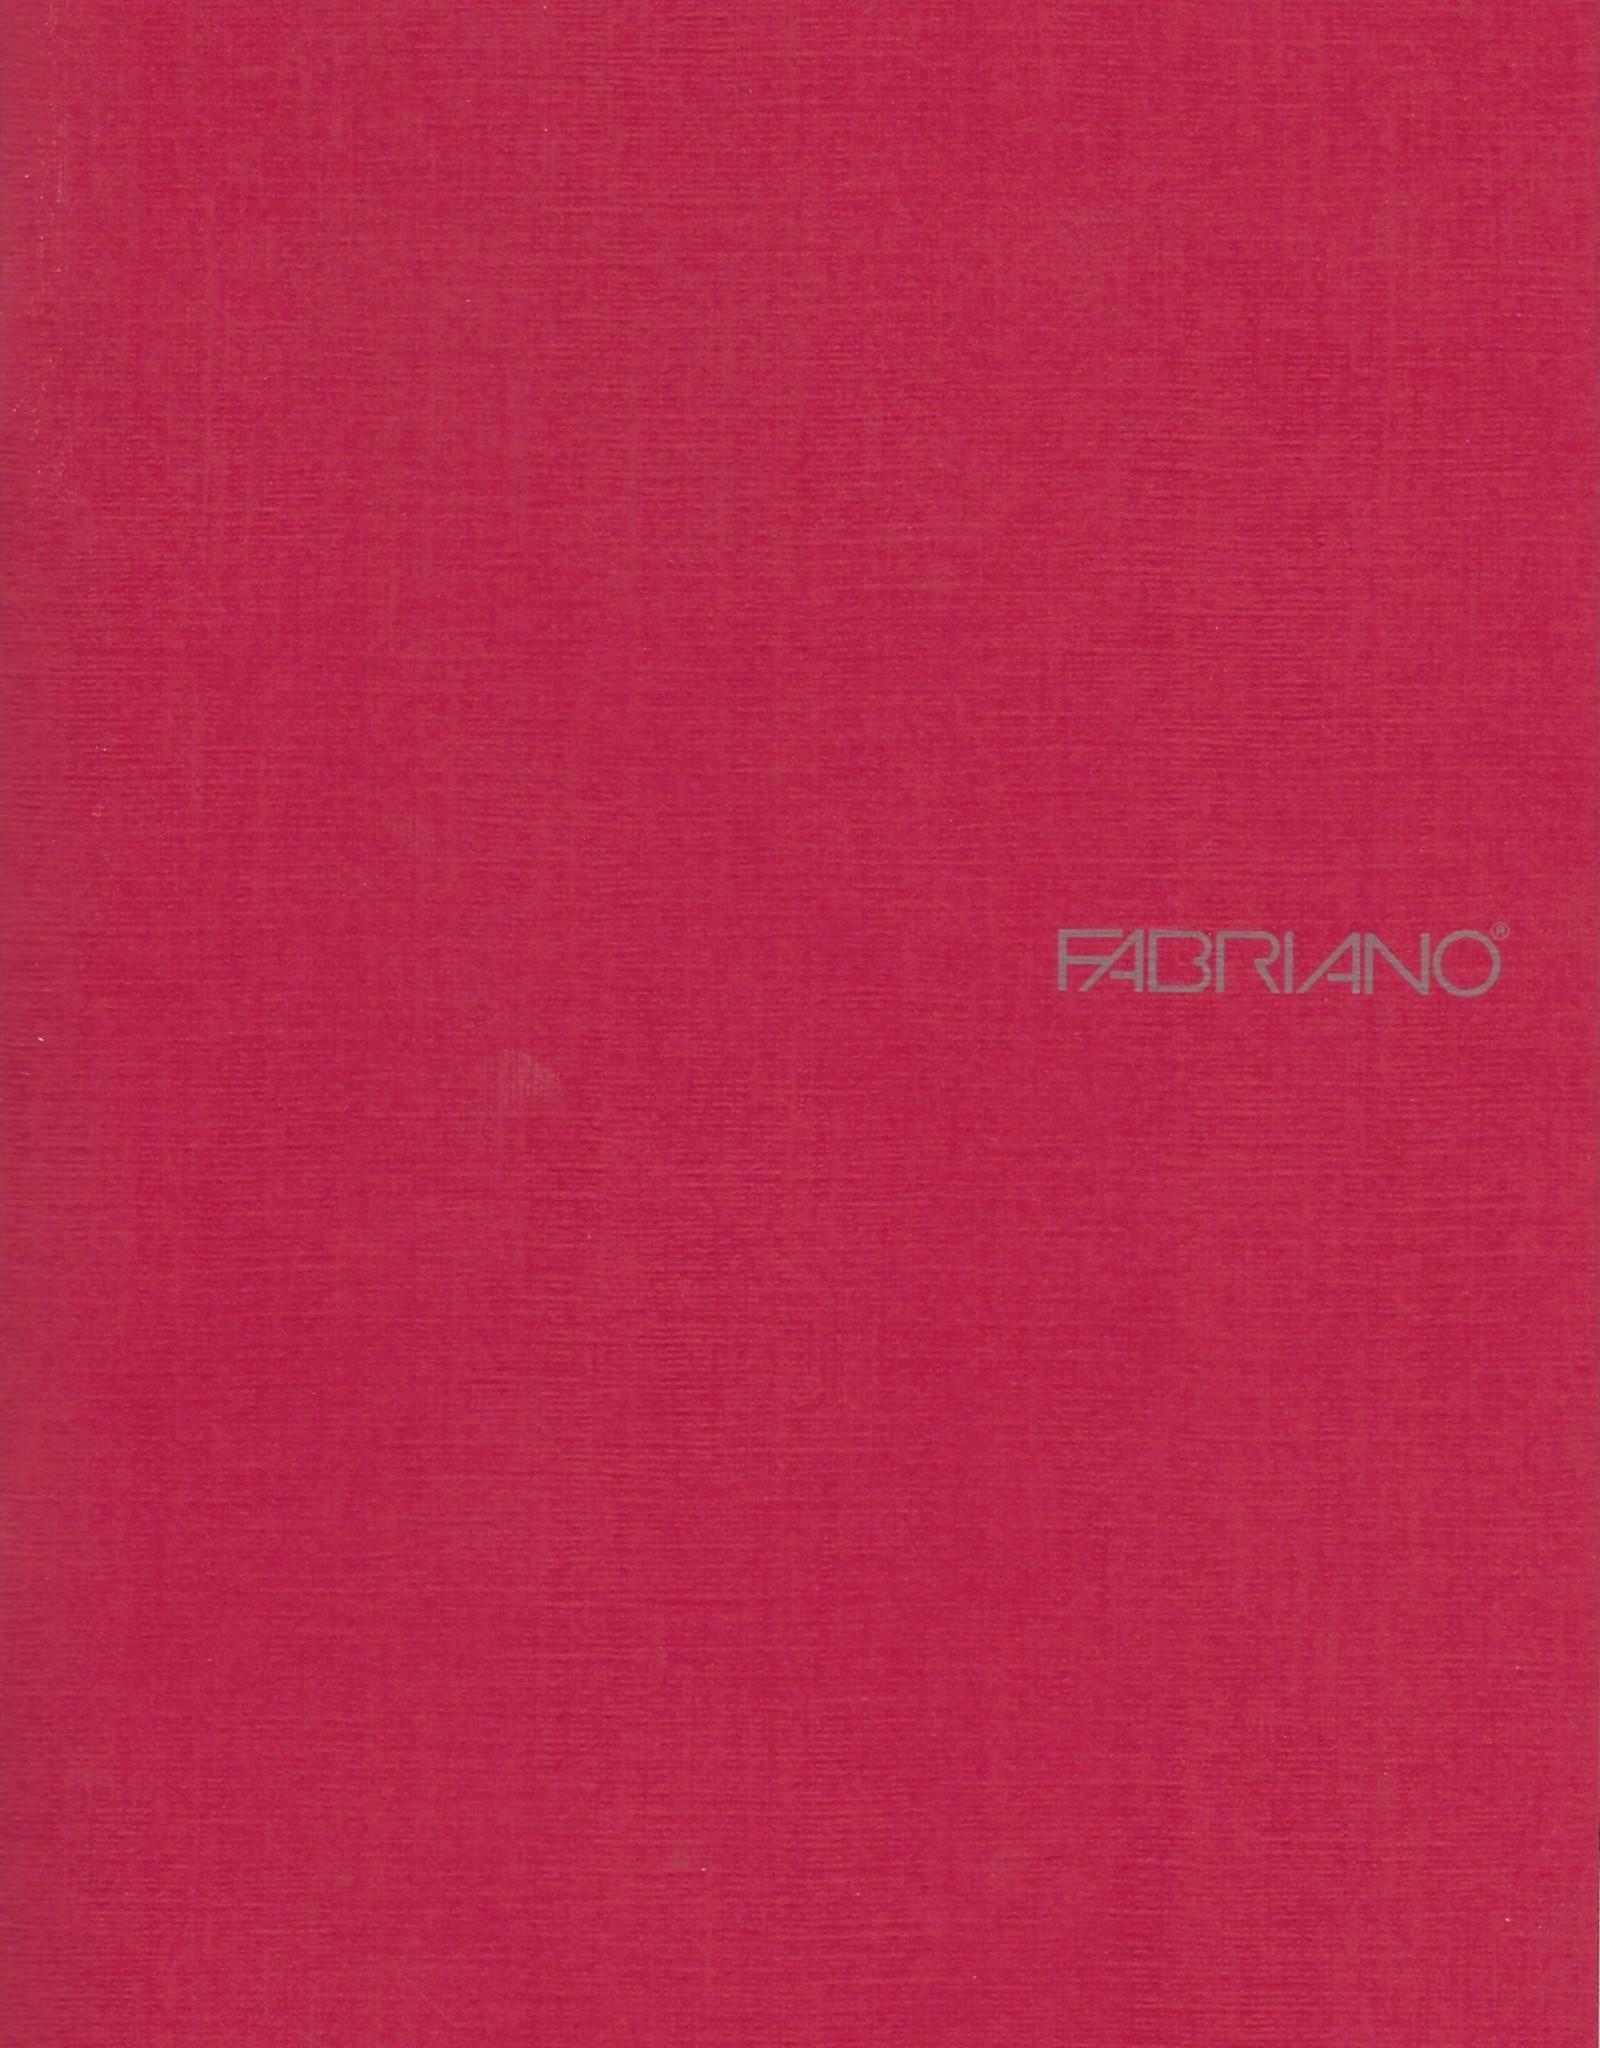 "Fabriano EcoQua Blank Notebook, Raspberry, 5.75"" x 8.25"" 40 Sheets"